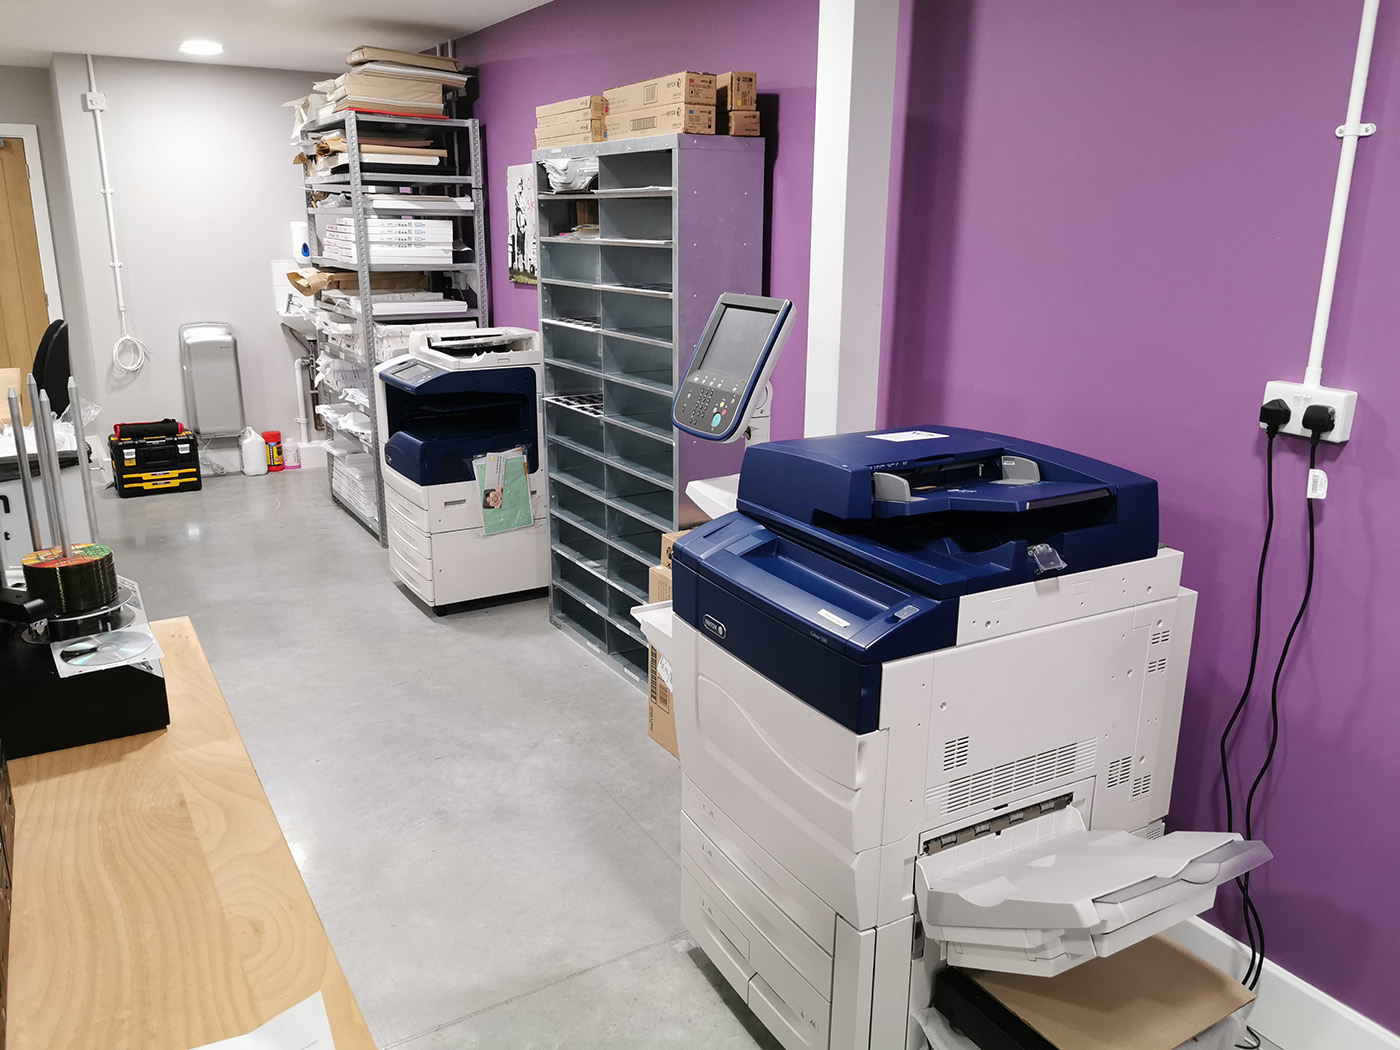 Xerox digital printers